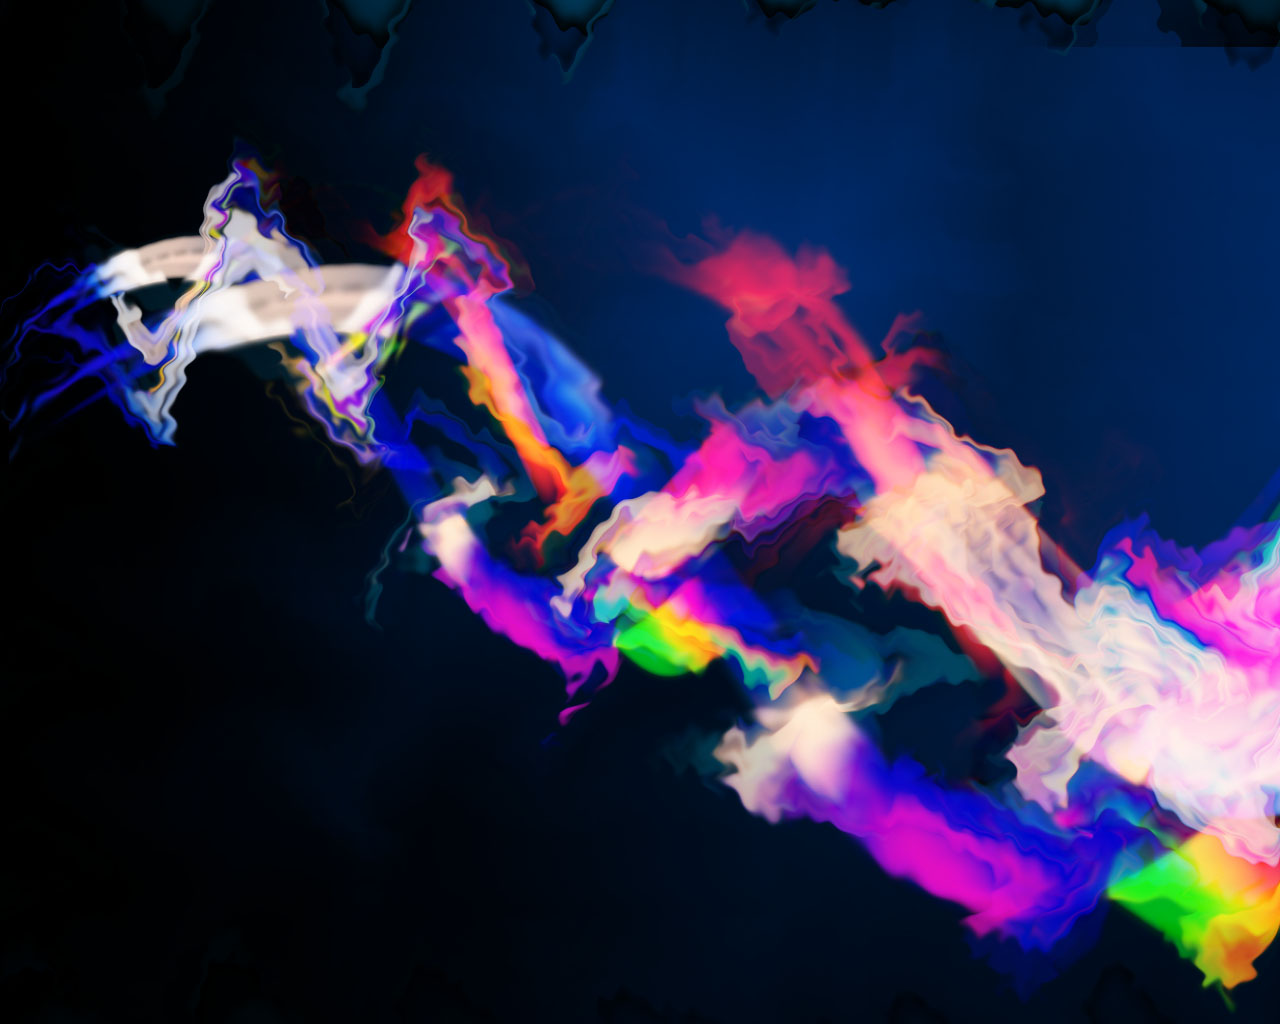 Fluro Fire by designconcepts